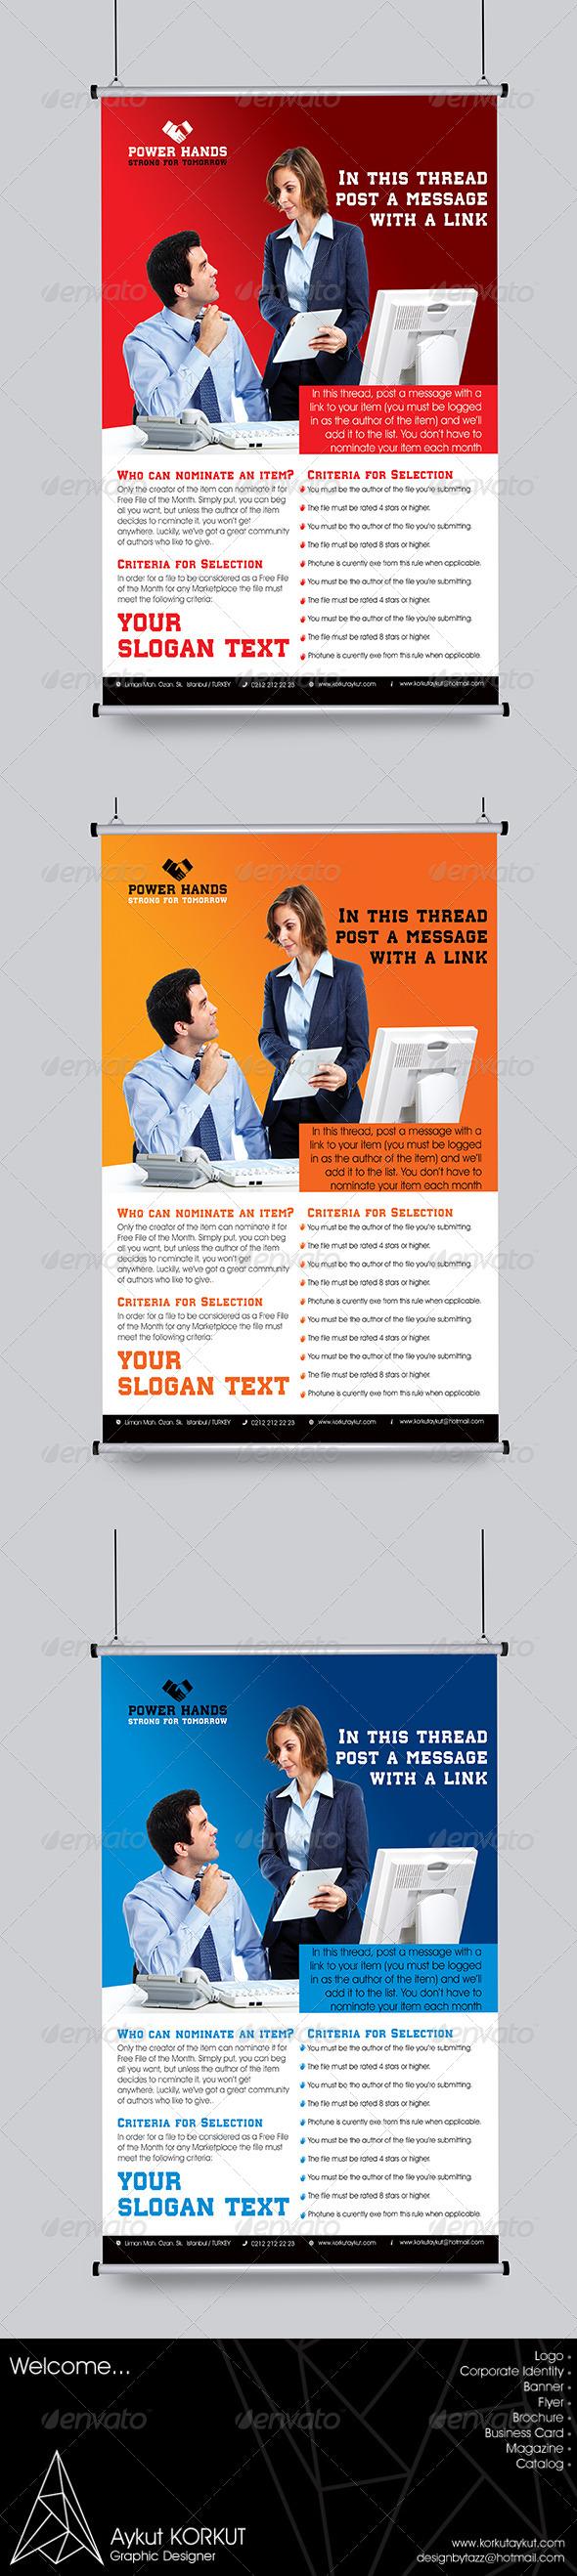 Power Hands Flyer Template - Flyers Print Templates